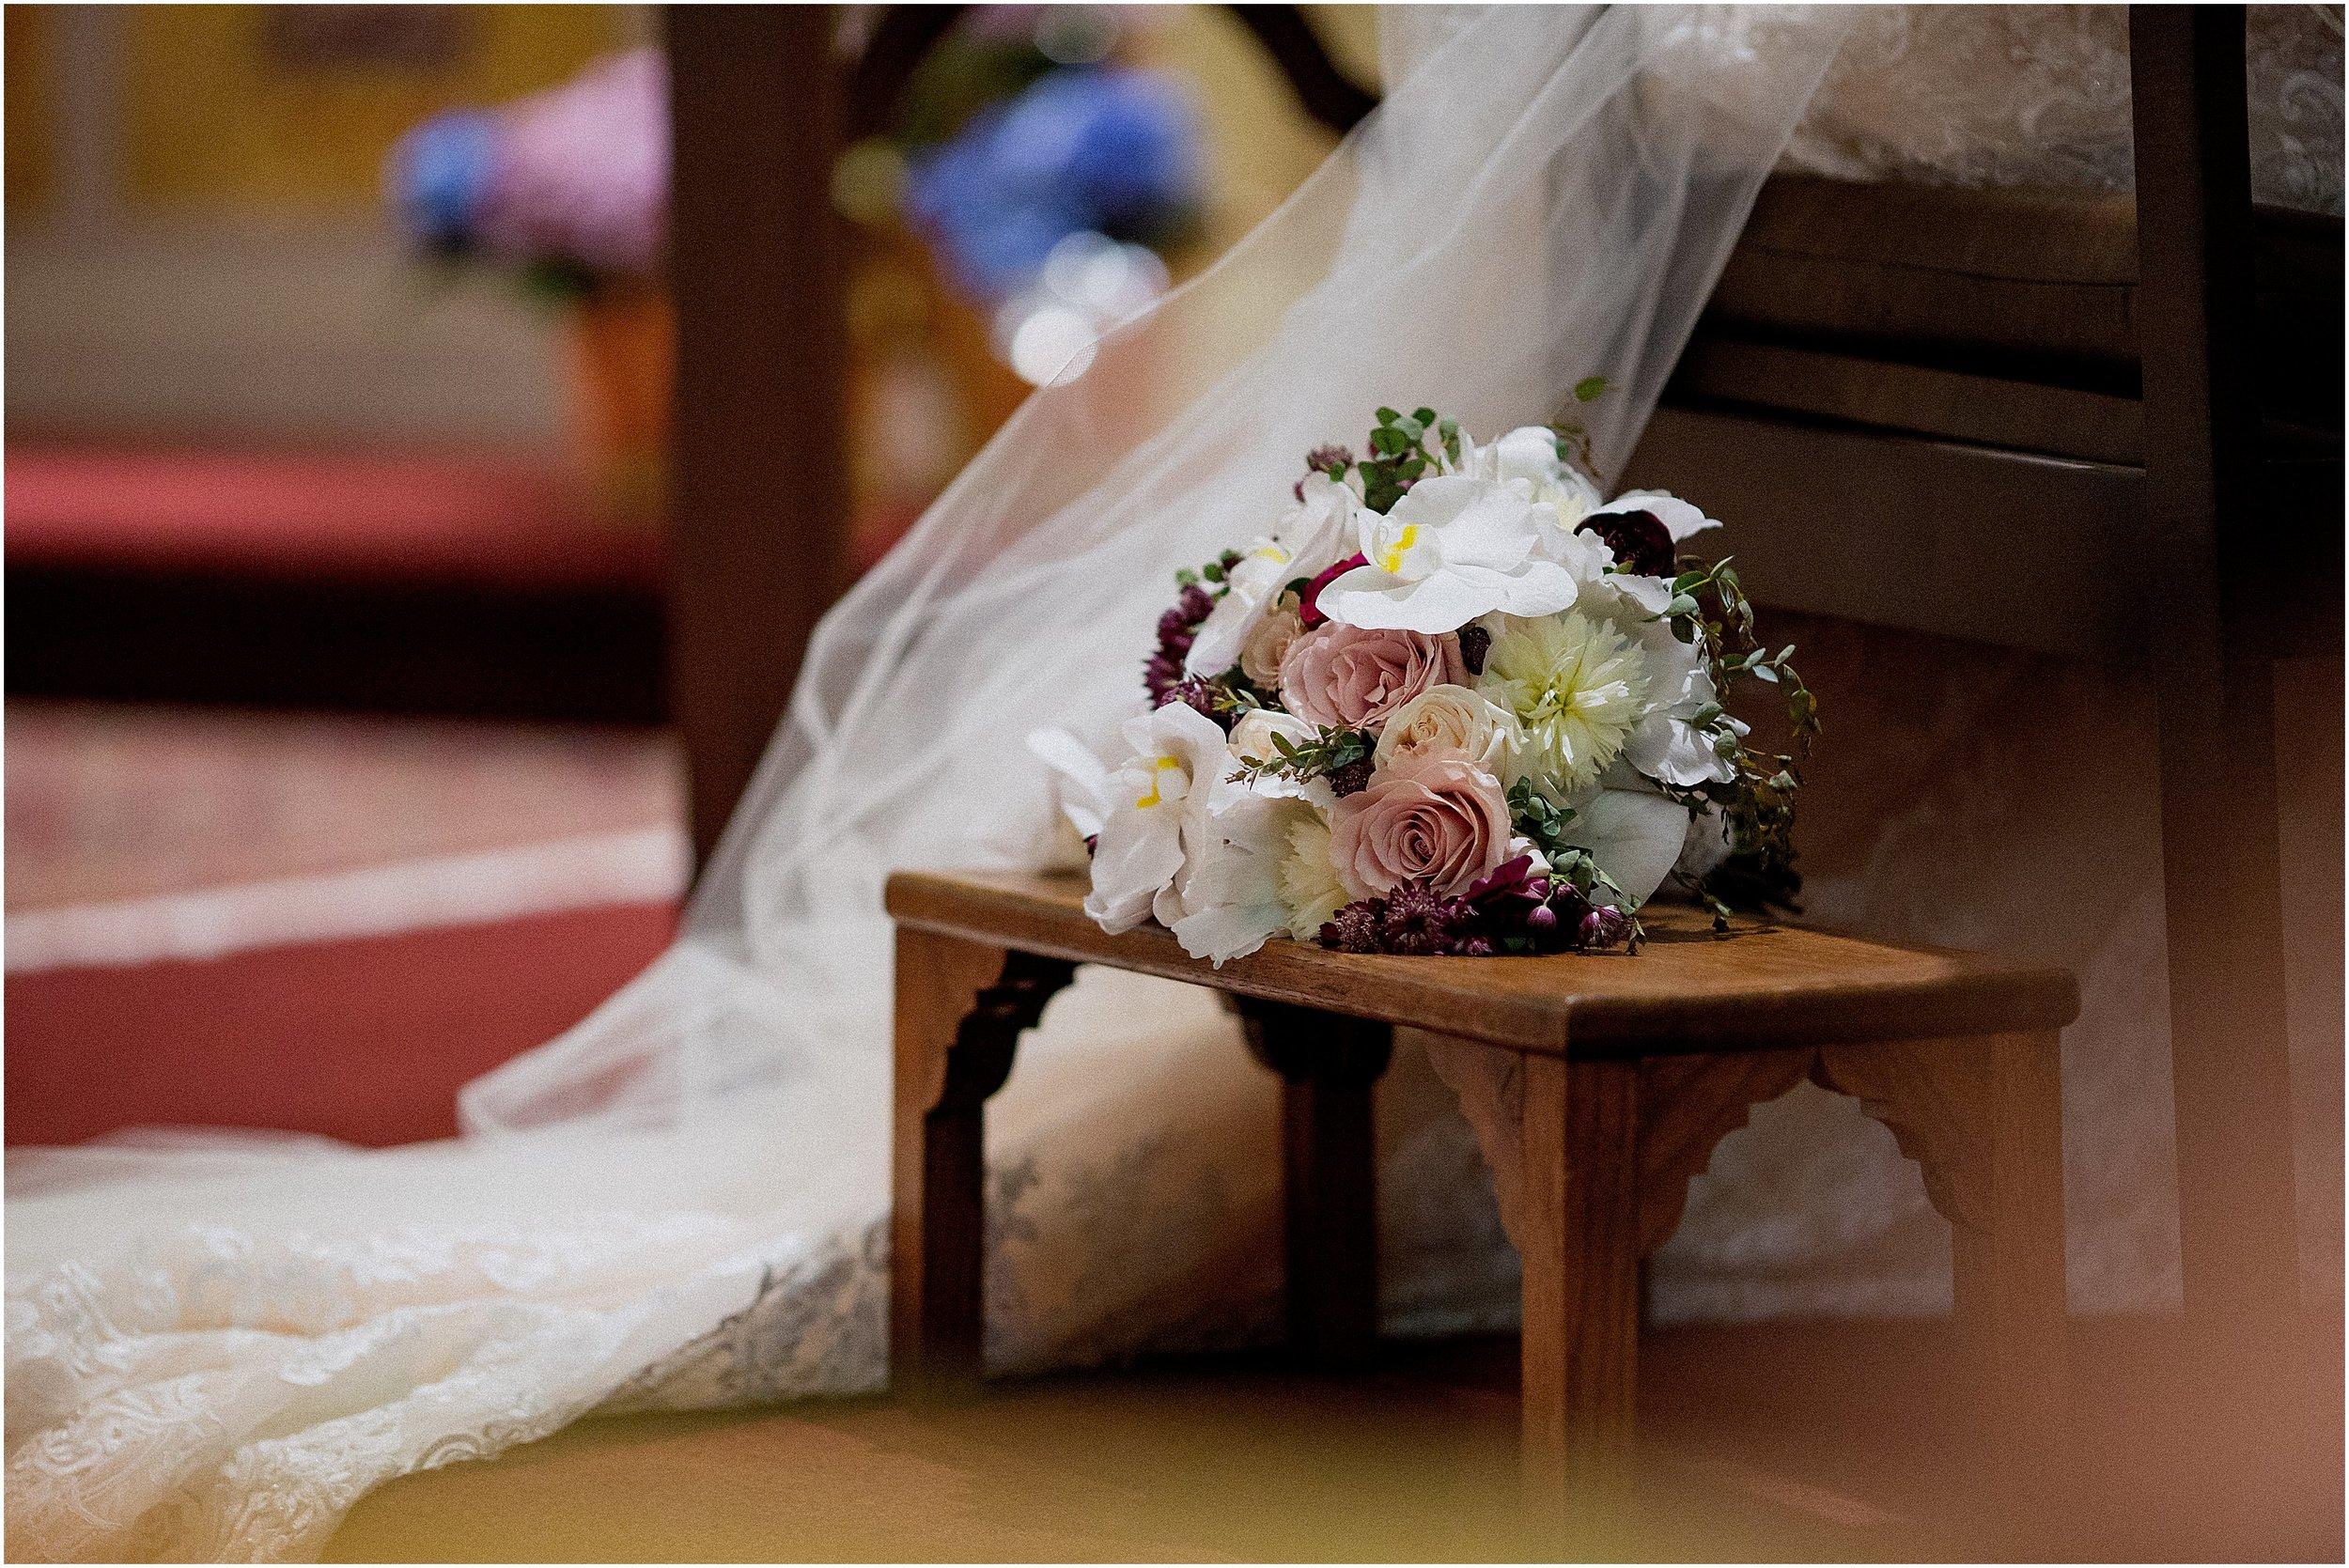 Philly_Wedding_Photographer_0025.jpg